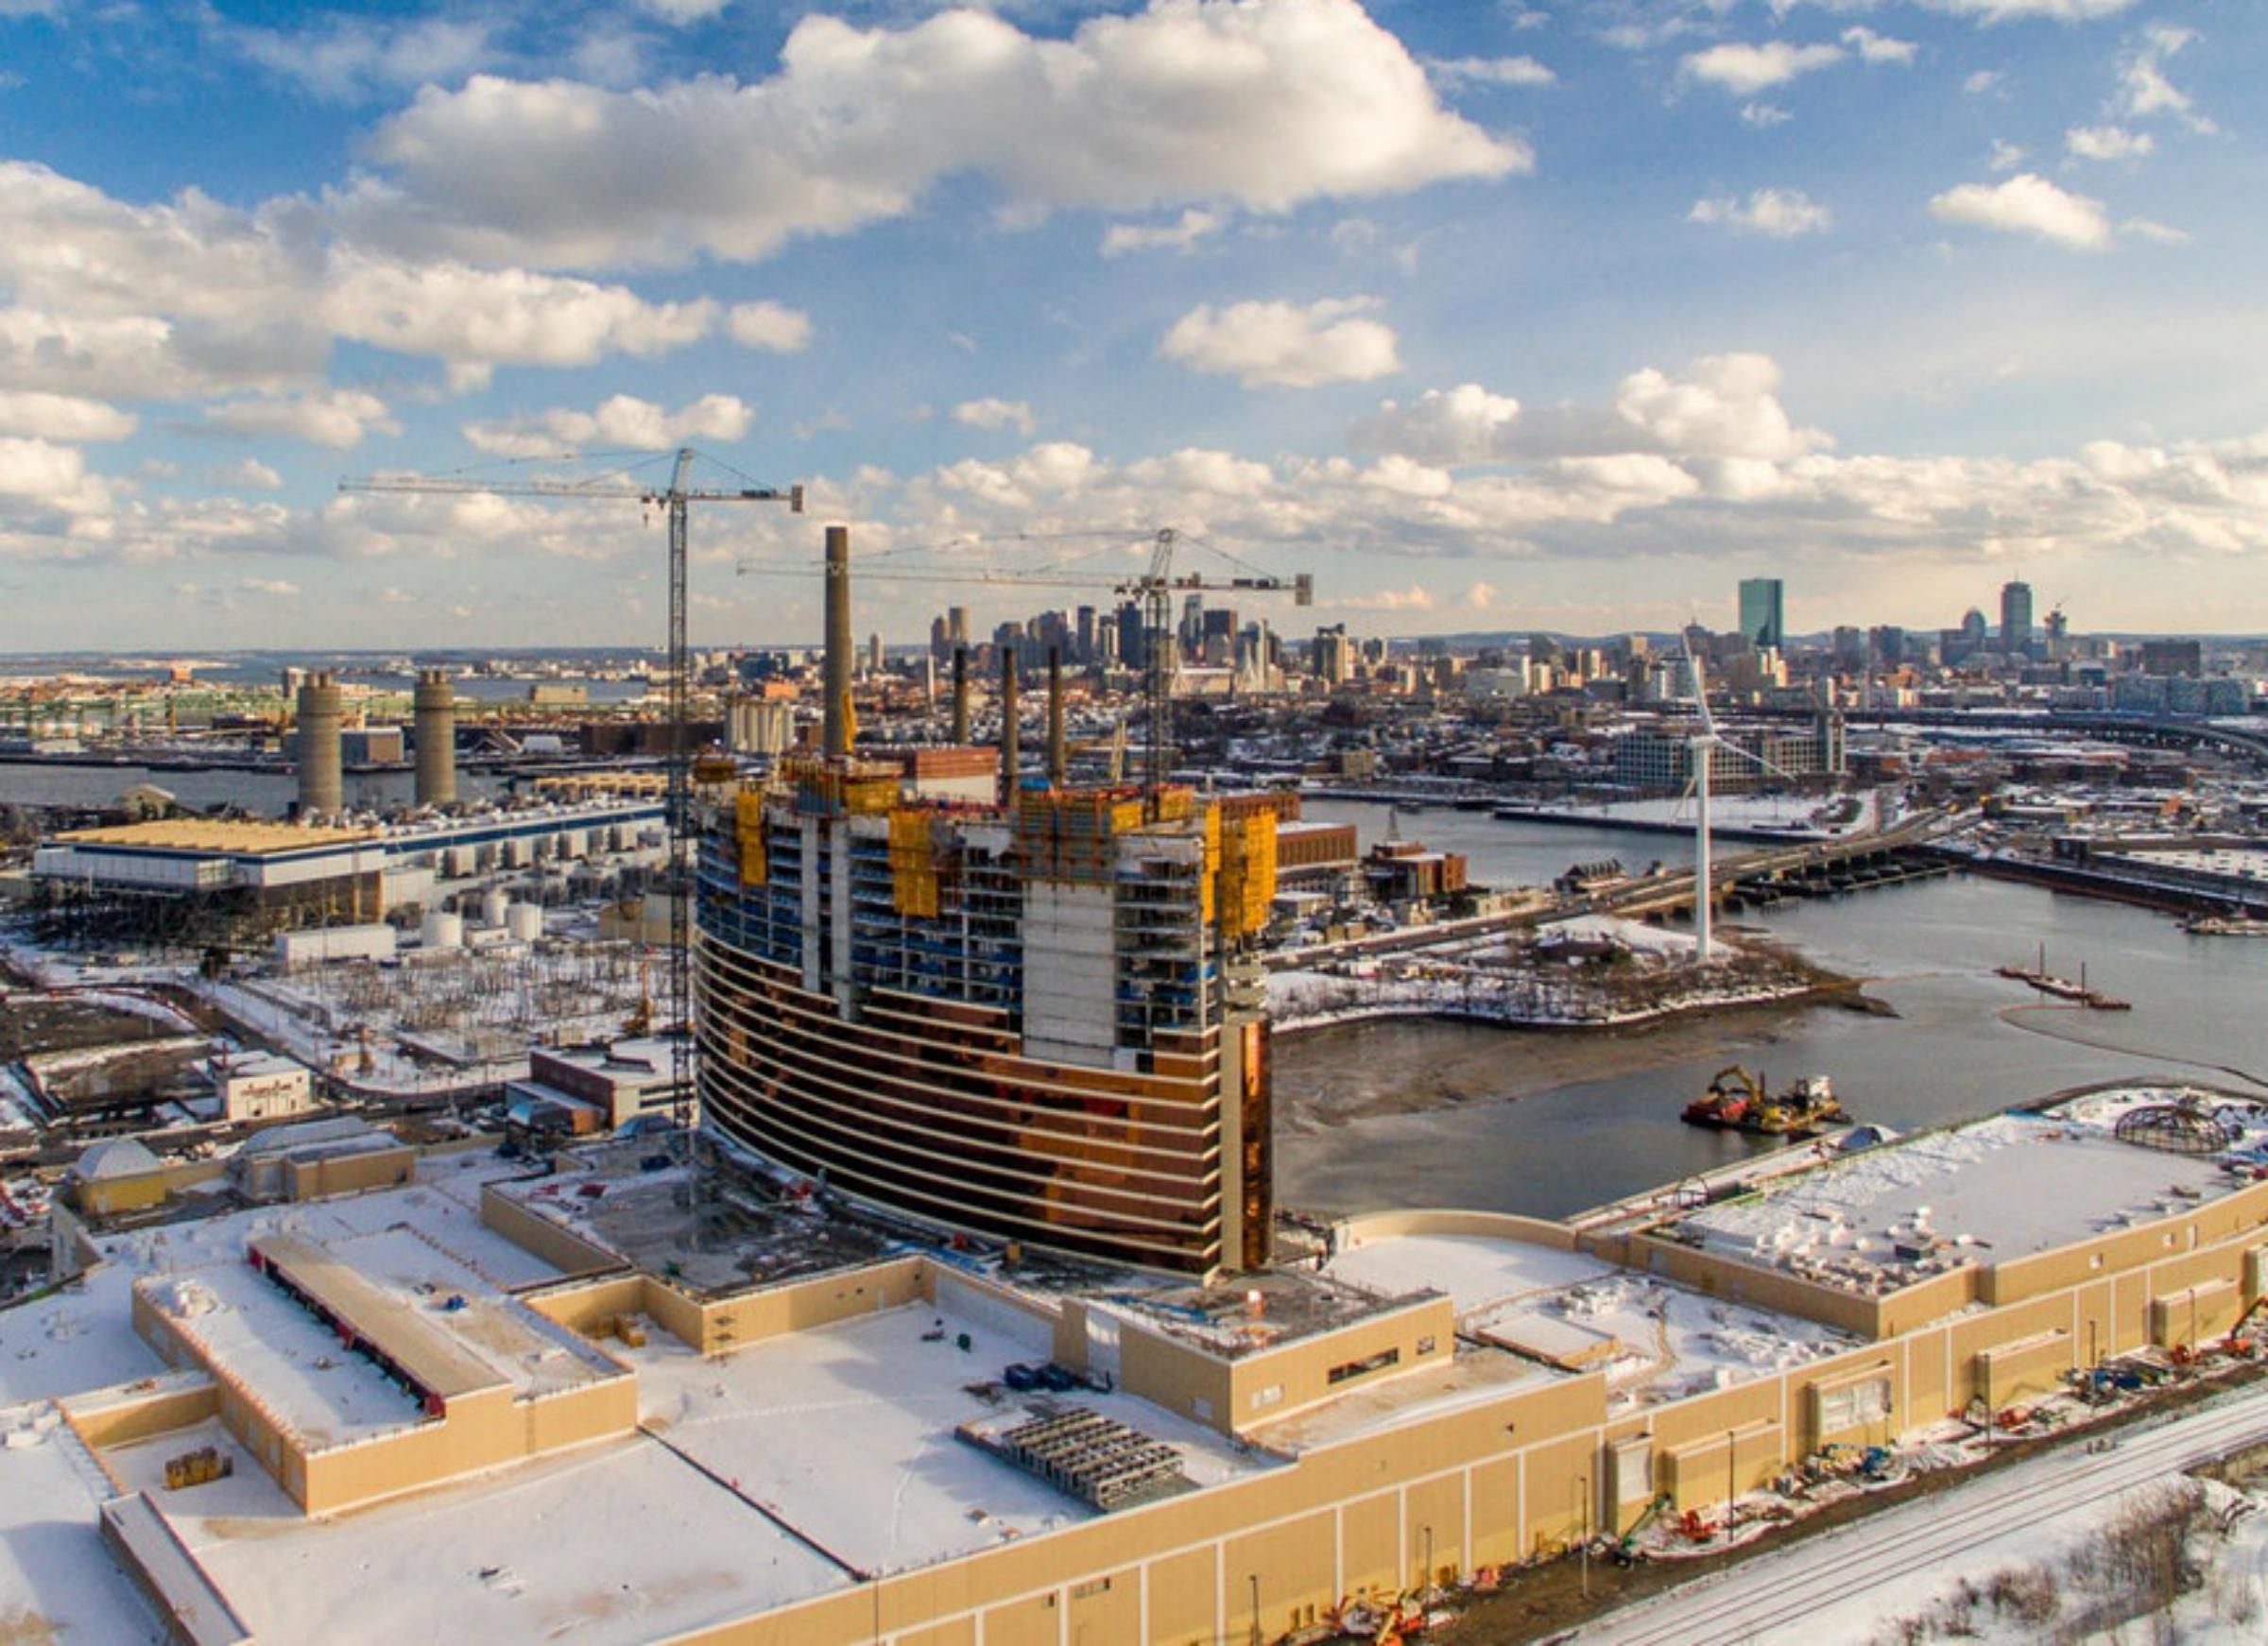 Wynn Resorts Boston Harbor